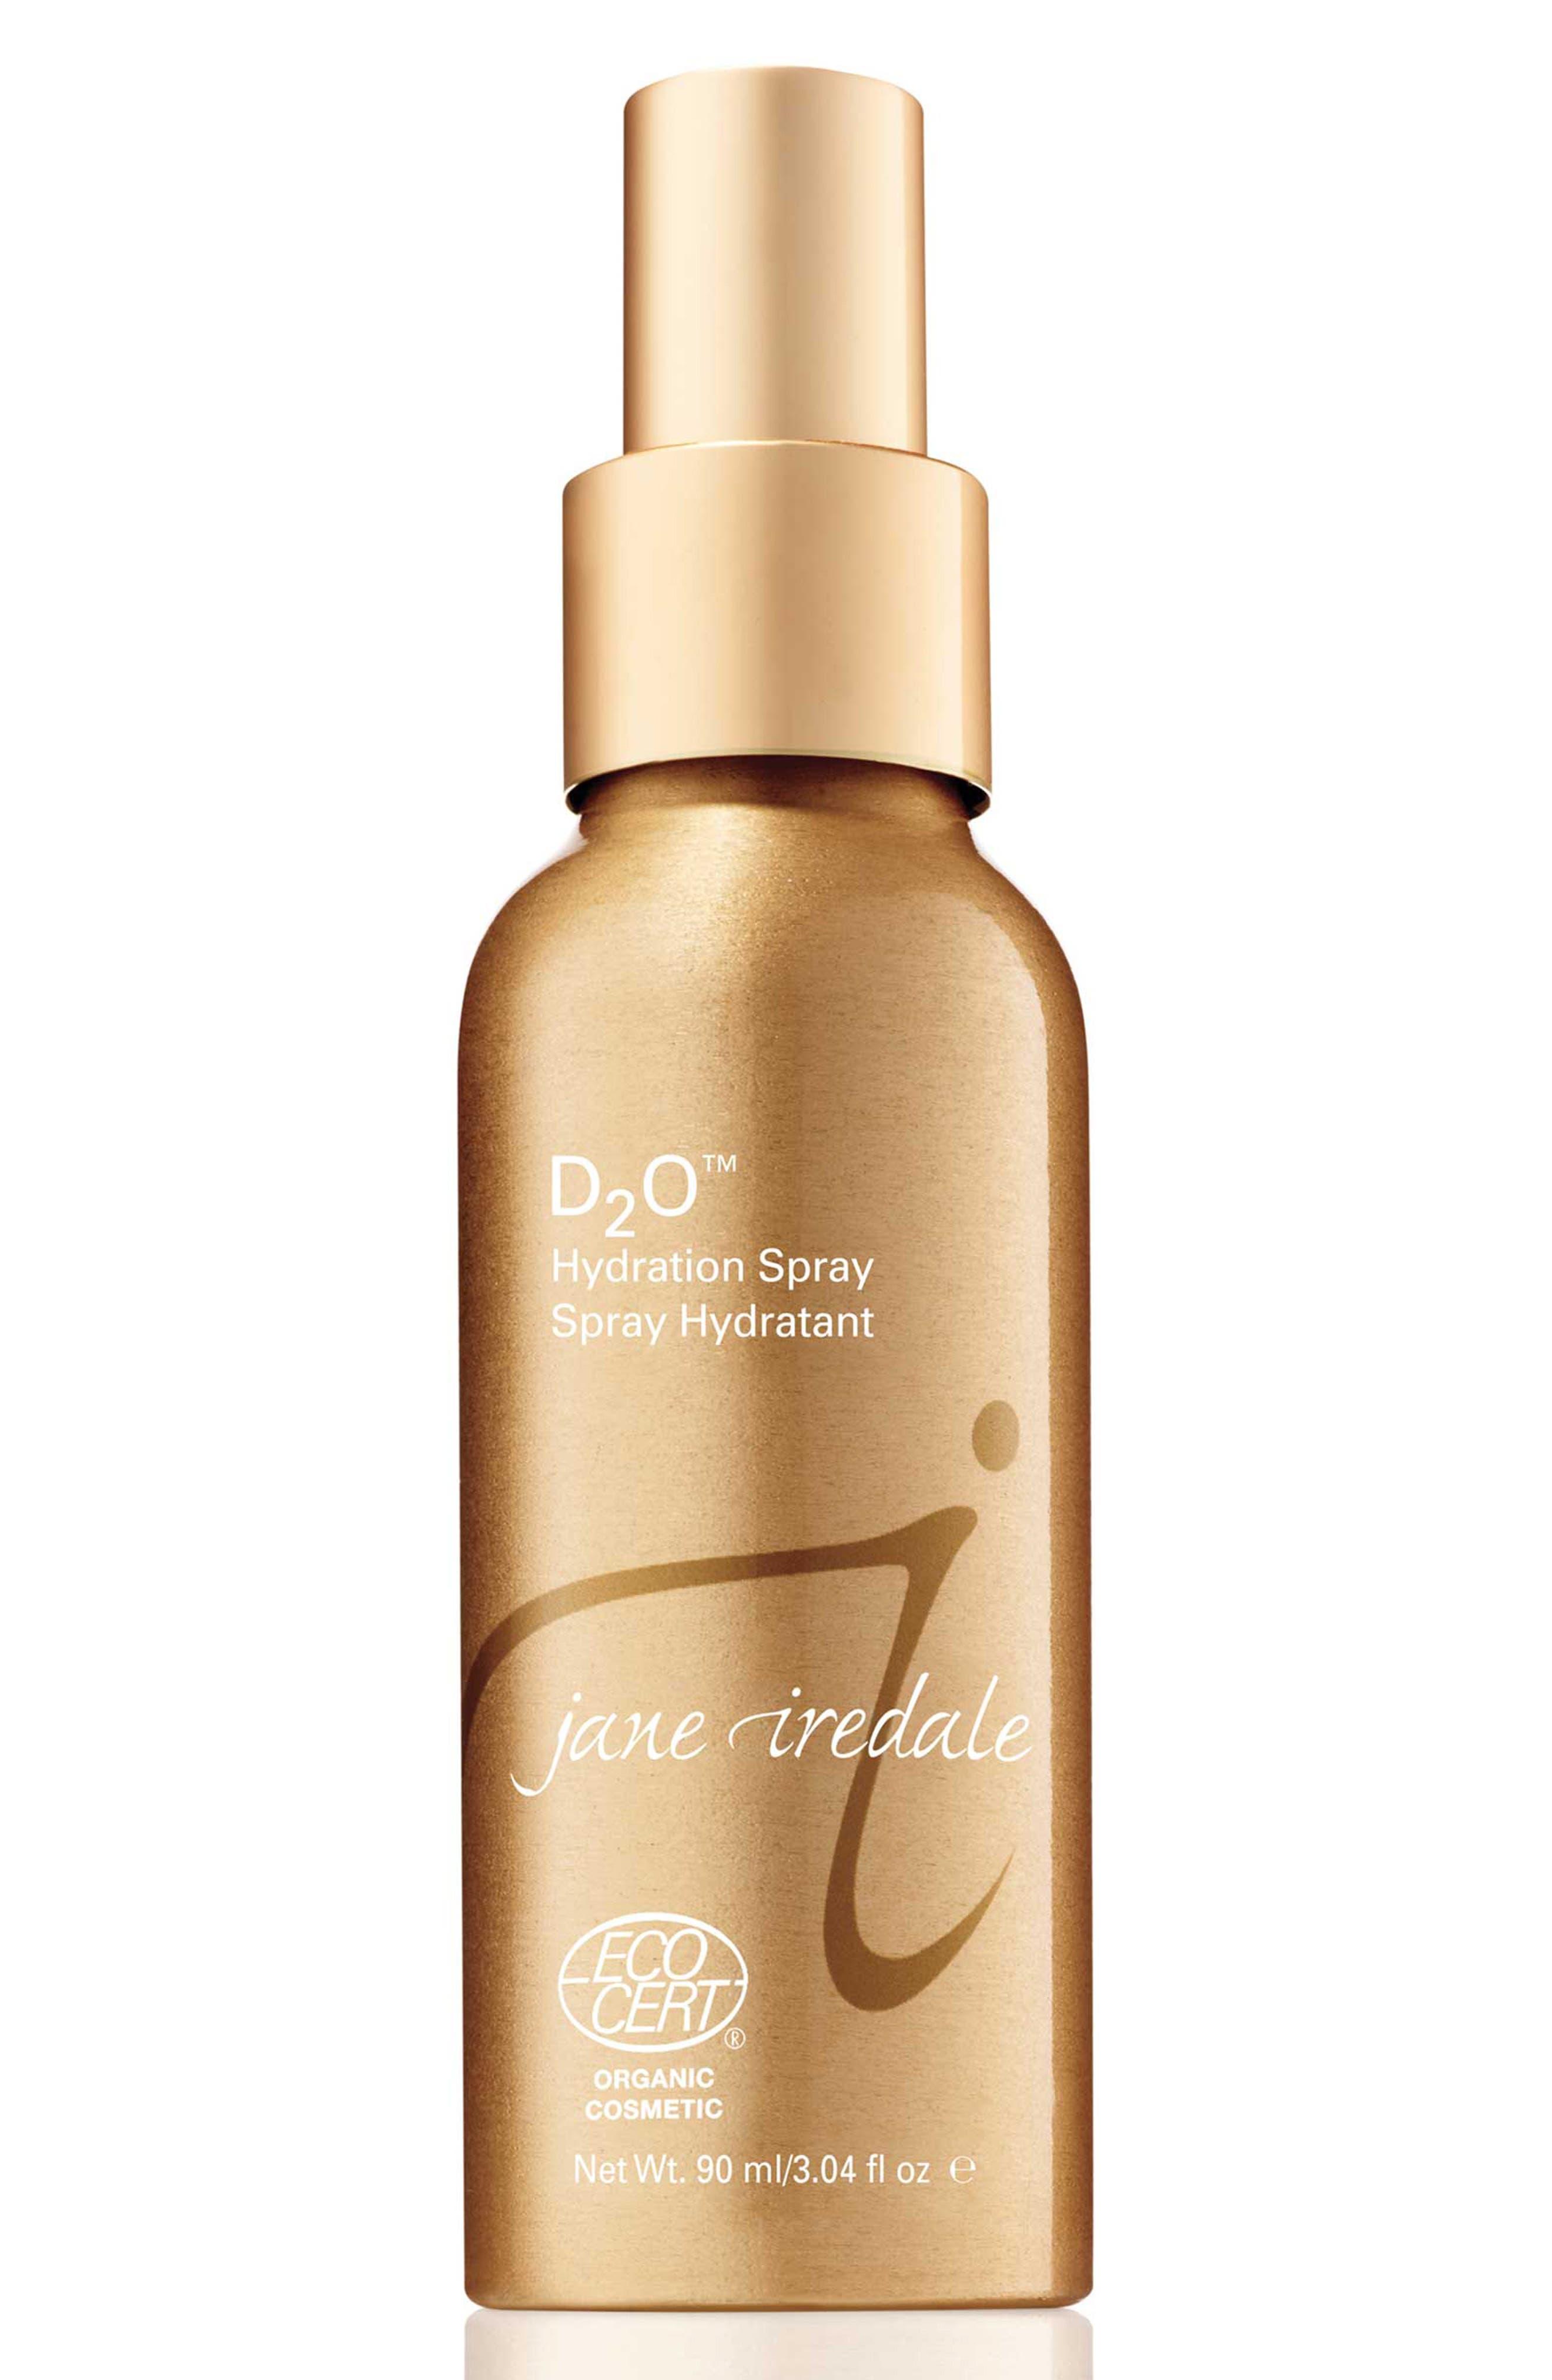 D2O(TM) Hydration Spray